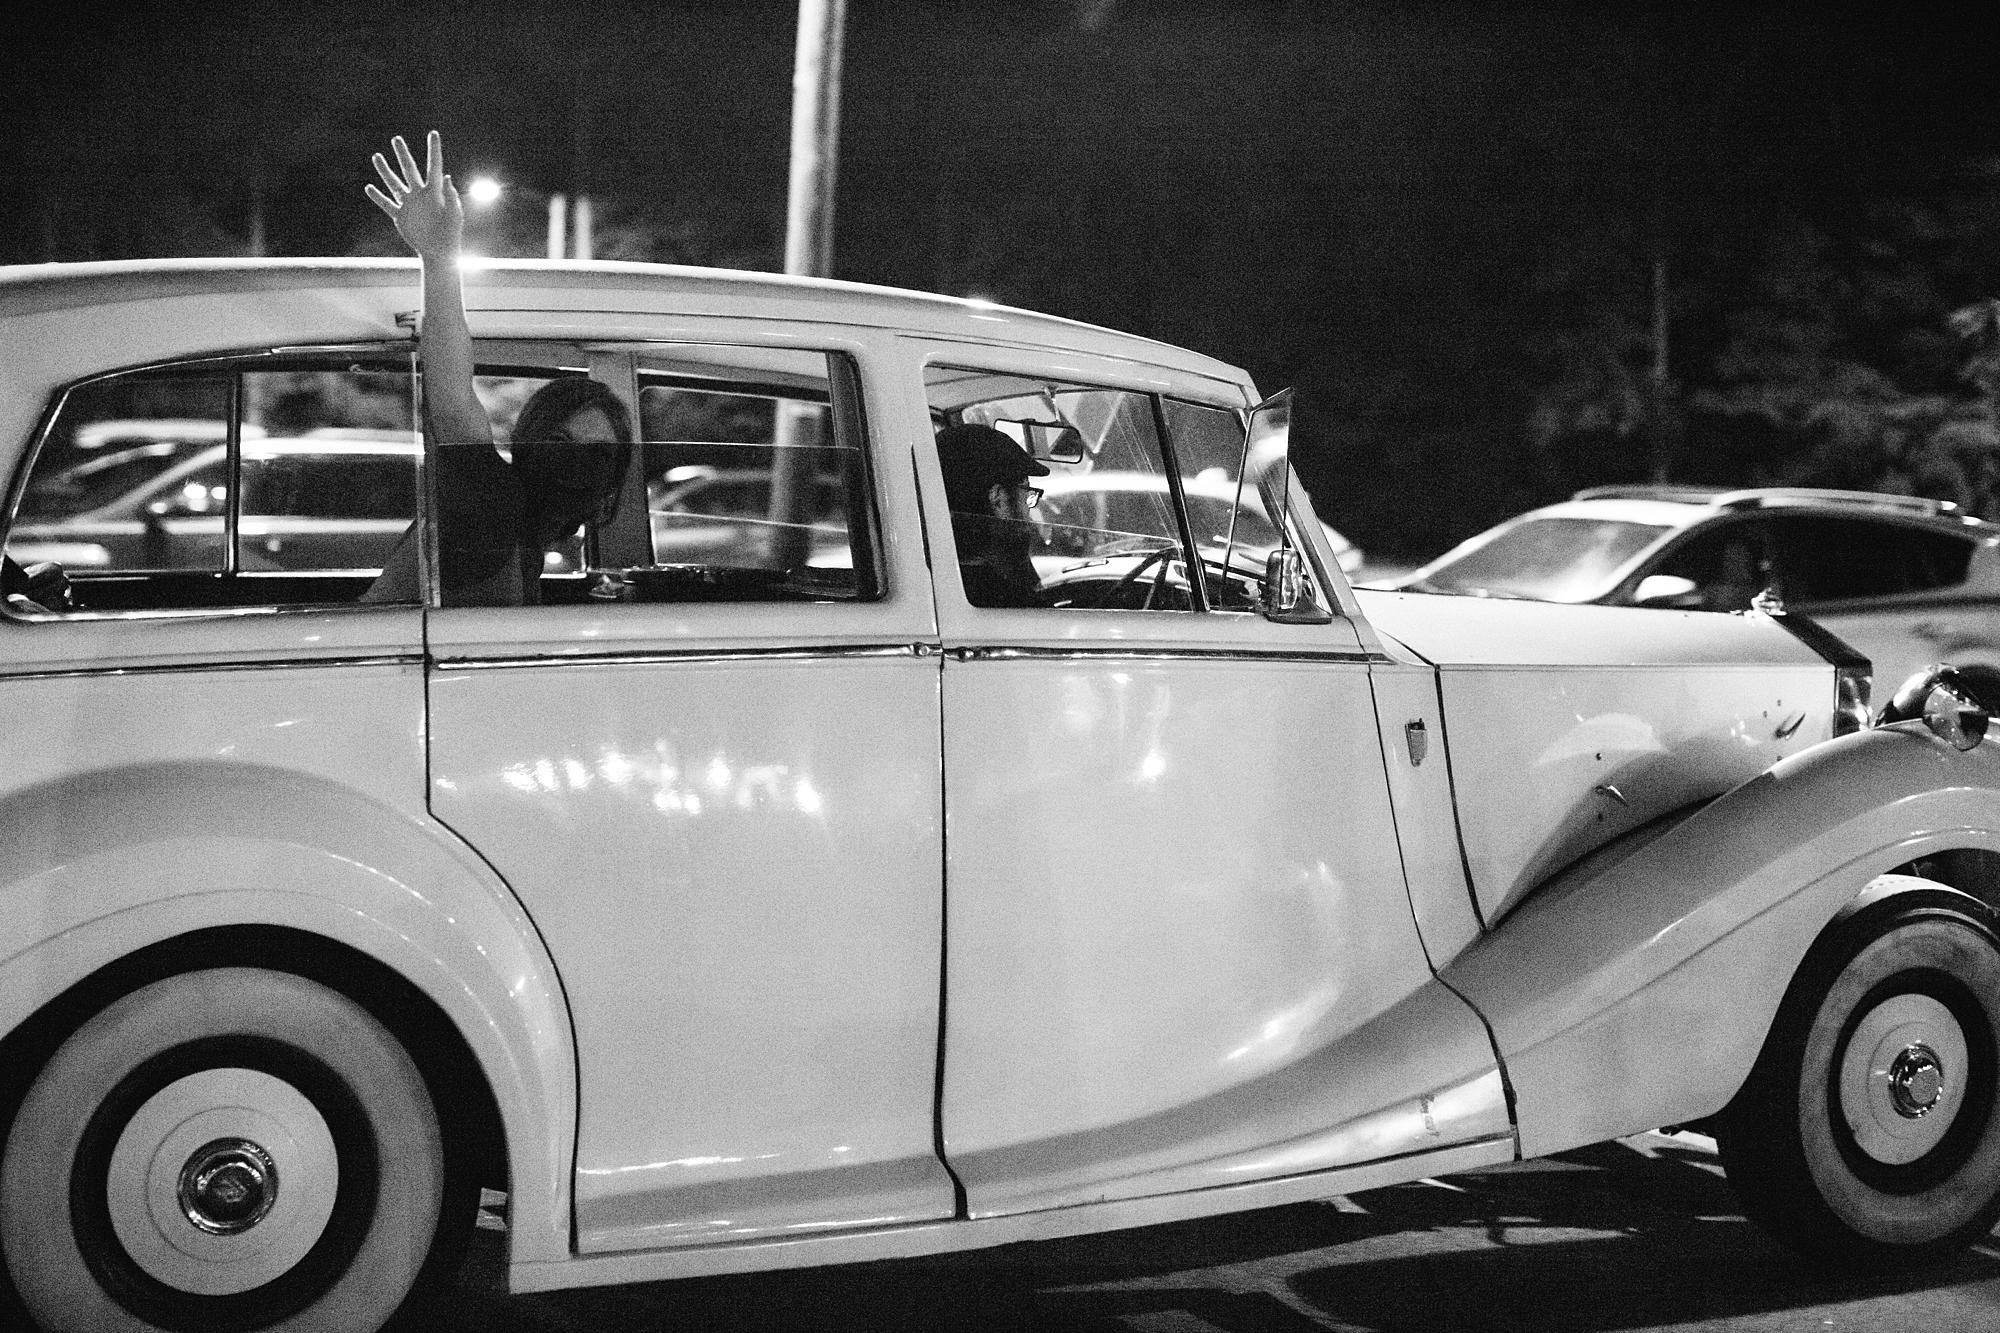 Angus-Barn-Pavilion-Raleigh-Wedding-Film-Photographer_0187.jpg